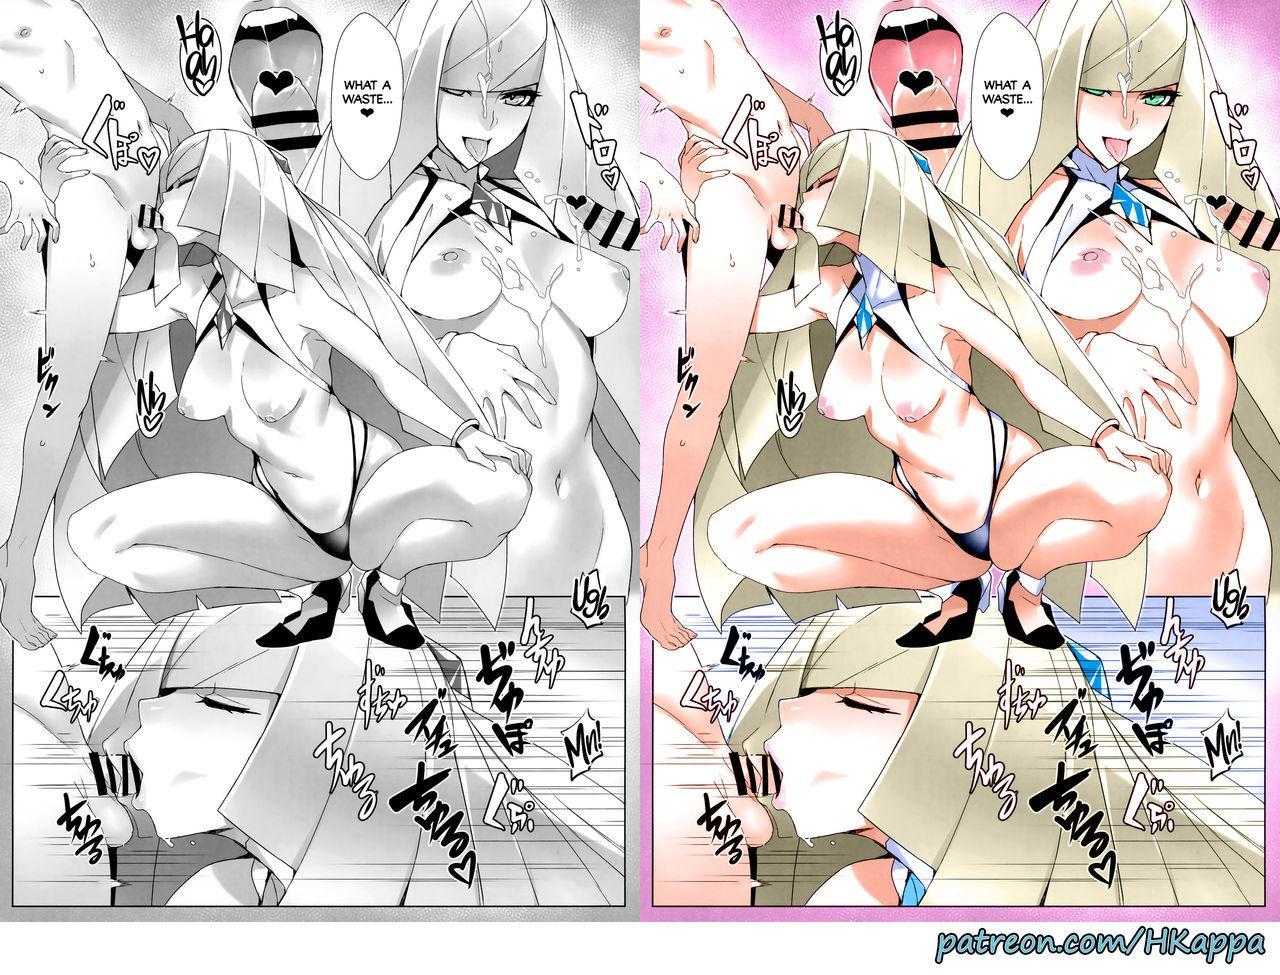 [Patreon] HKappa: Venus Infection - Ban! - Pokemon English Full Color 12